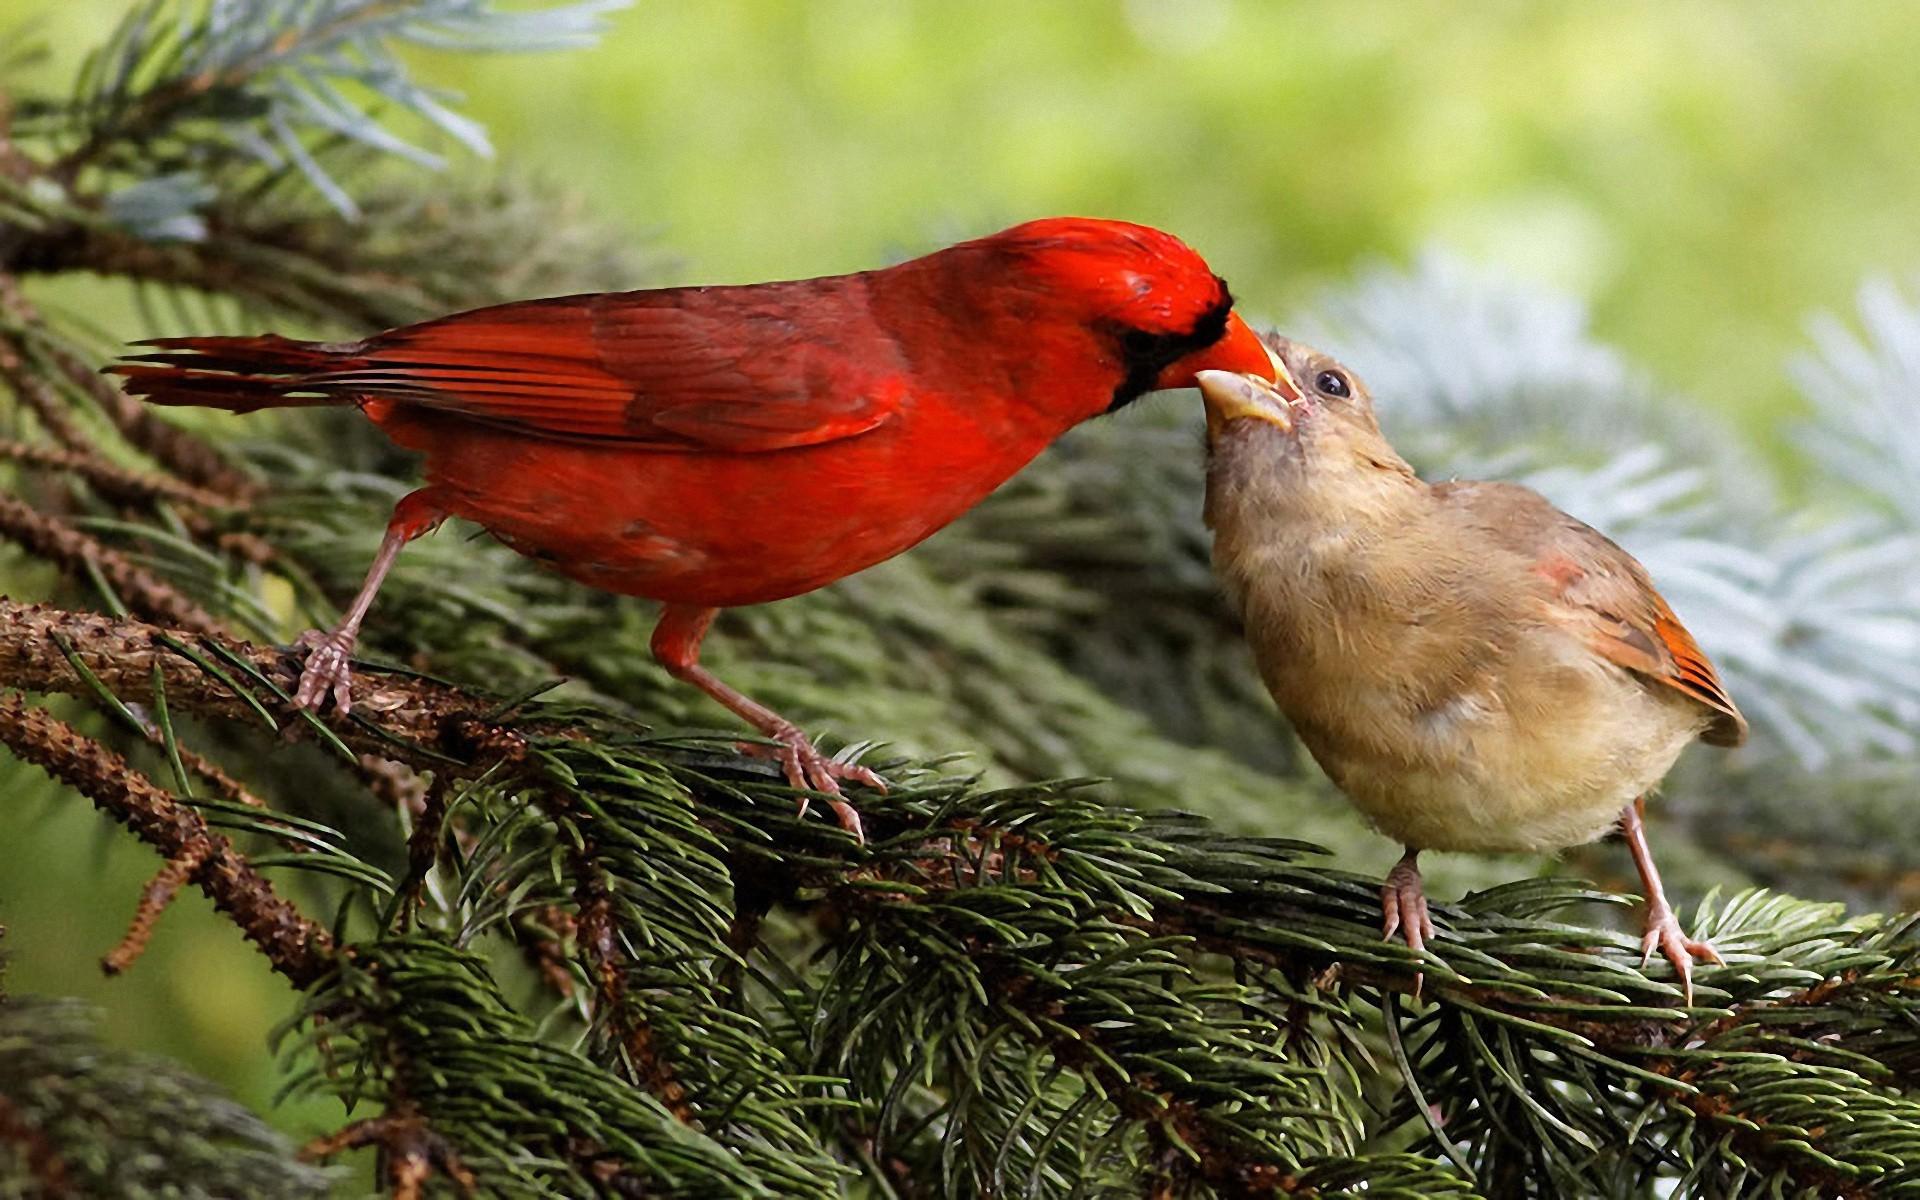 37 winter birds and animals wallpaper on wallpapersafari - Winter cardinal wallpaper ...